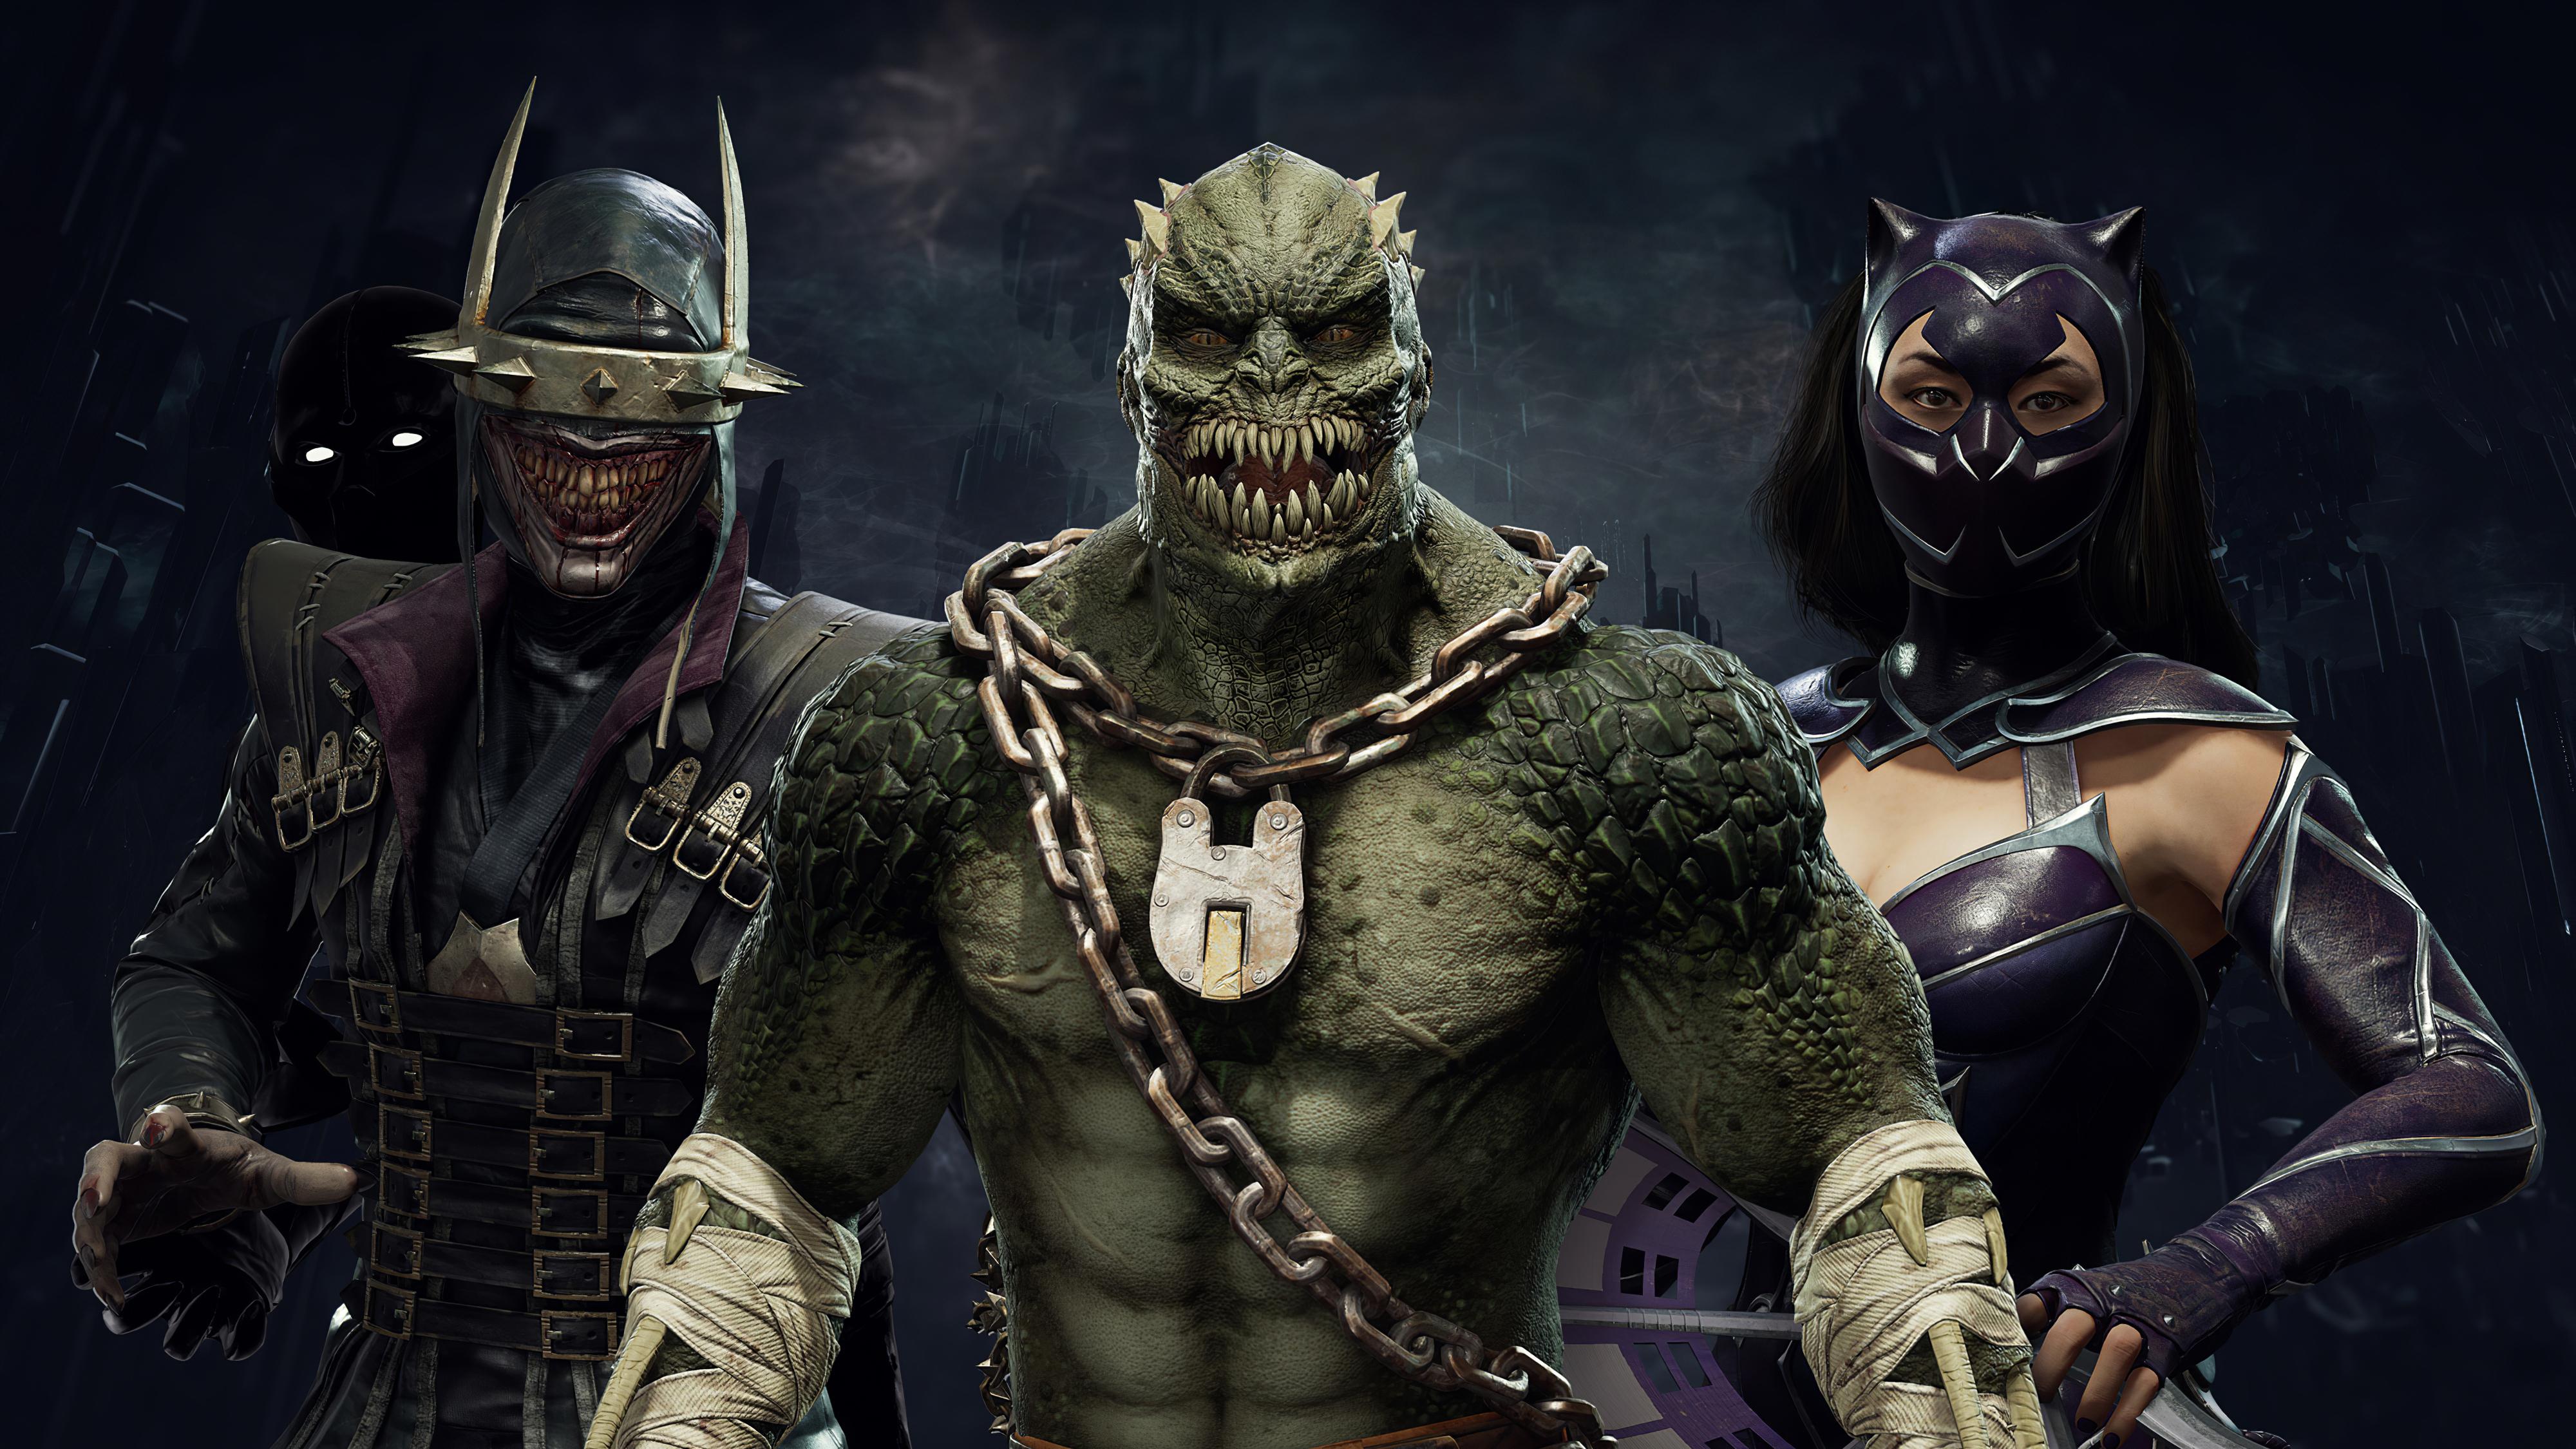 Wallpaper 4k Dc Elseworlds Skin Pack Mortal Kombat 11 Dc